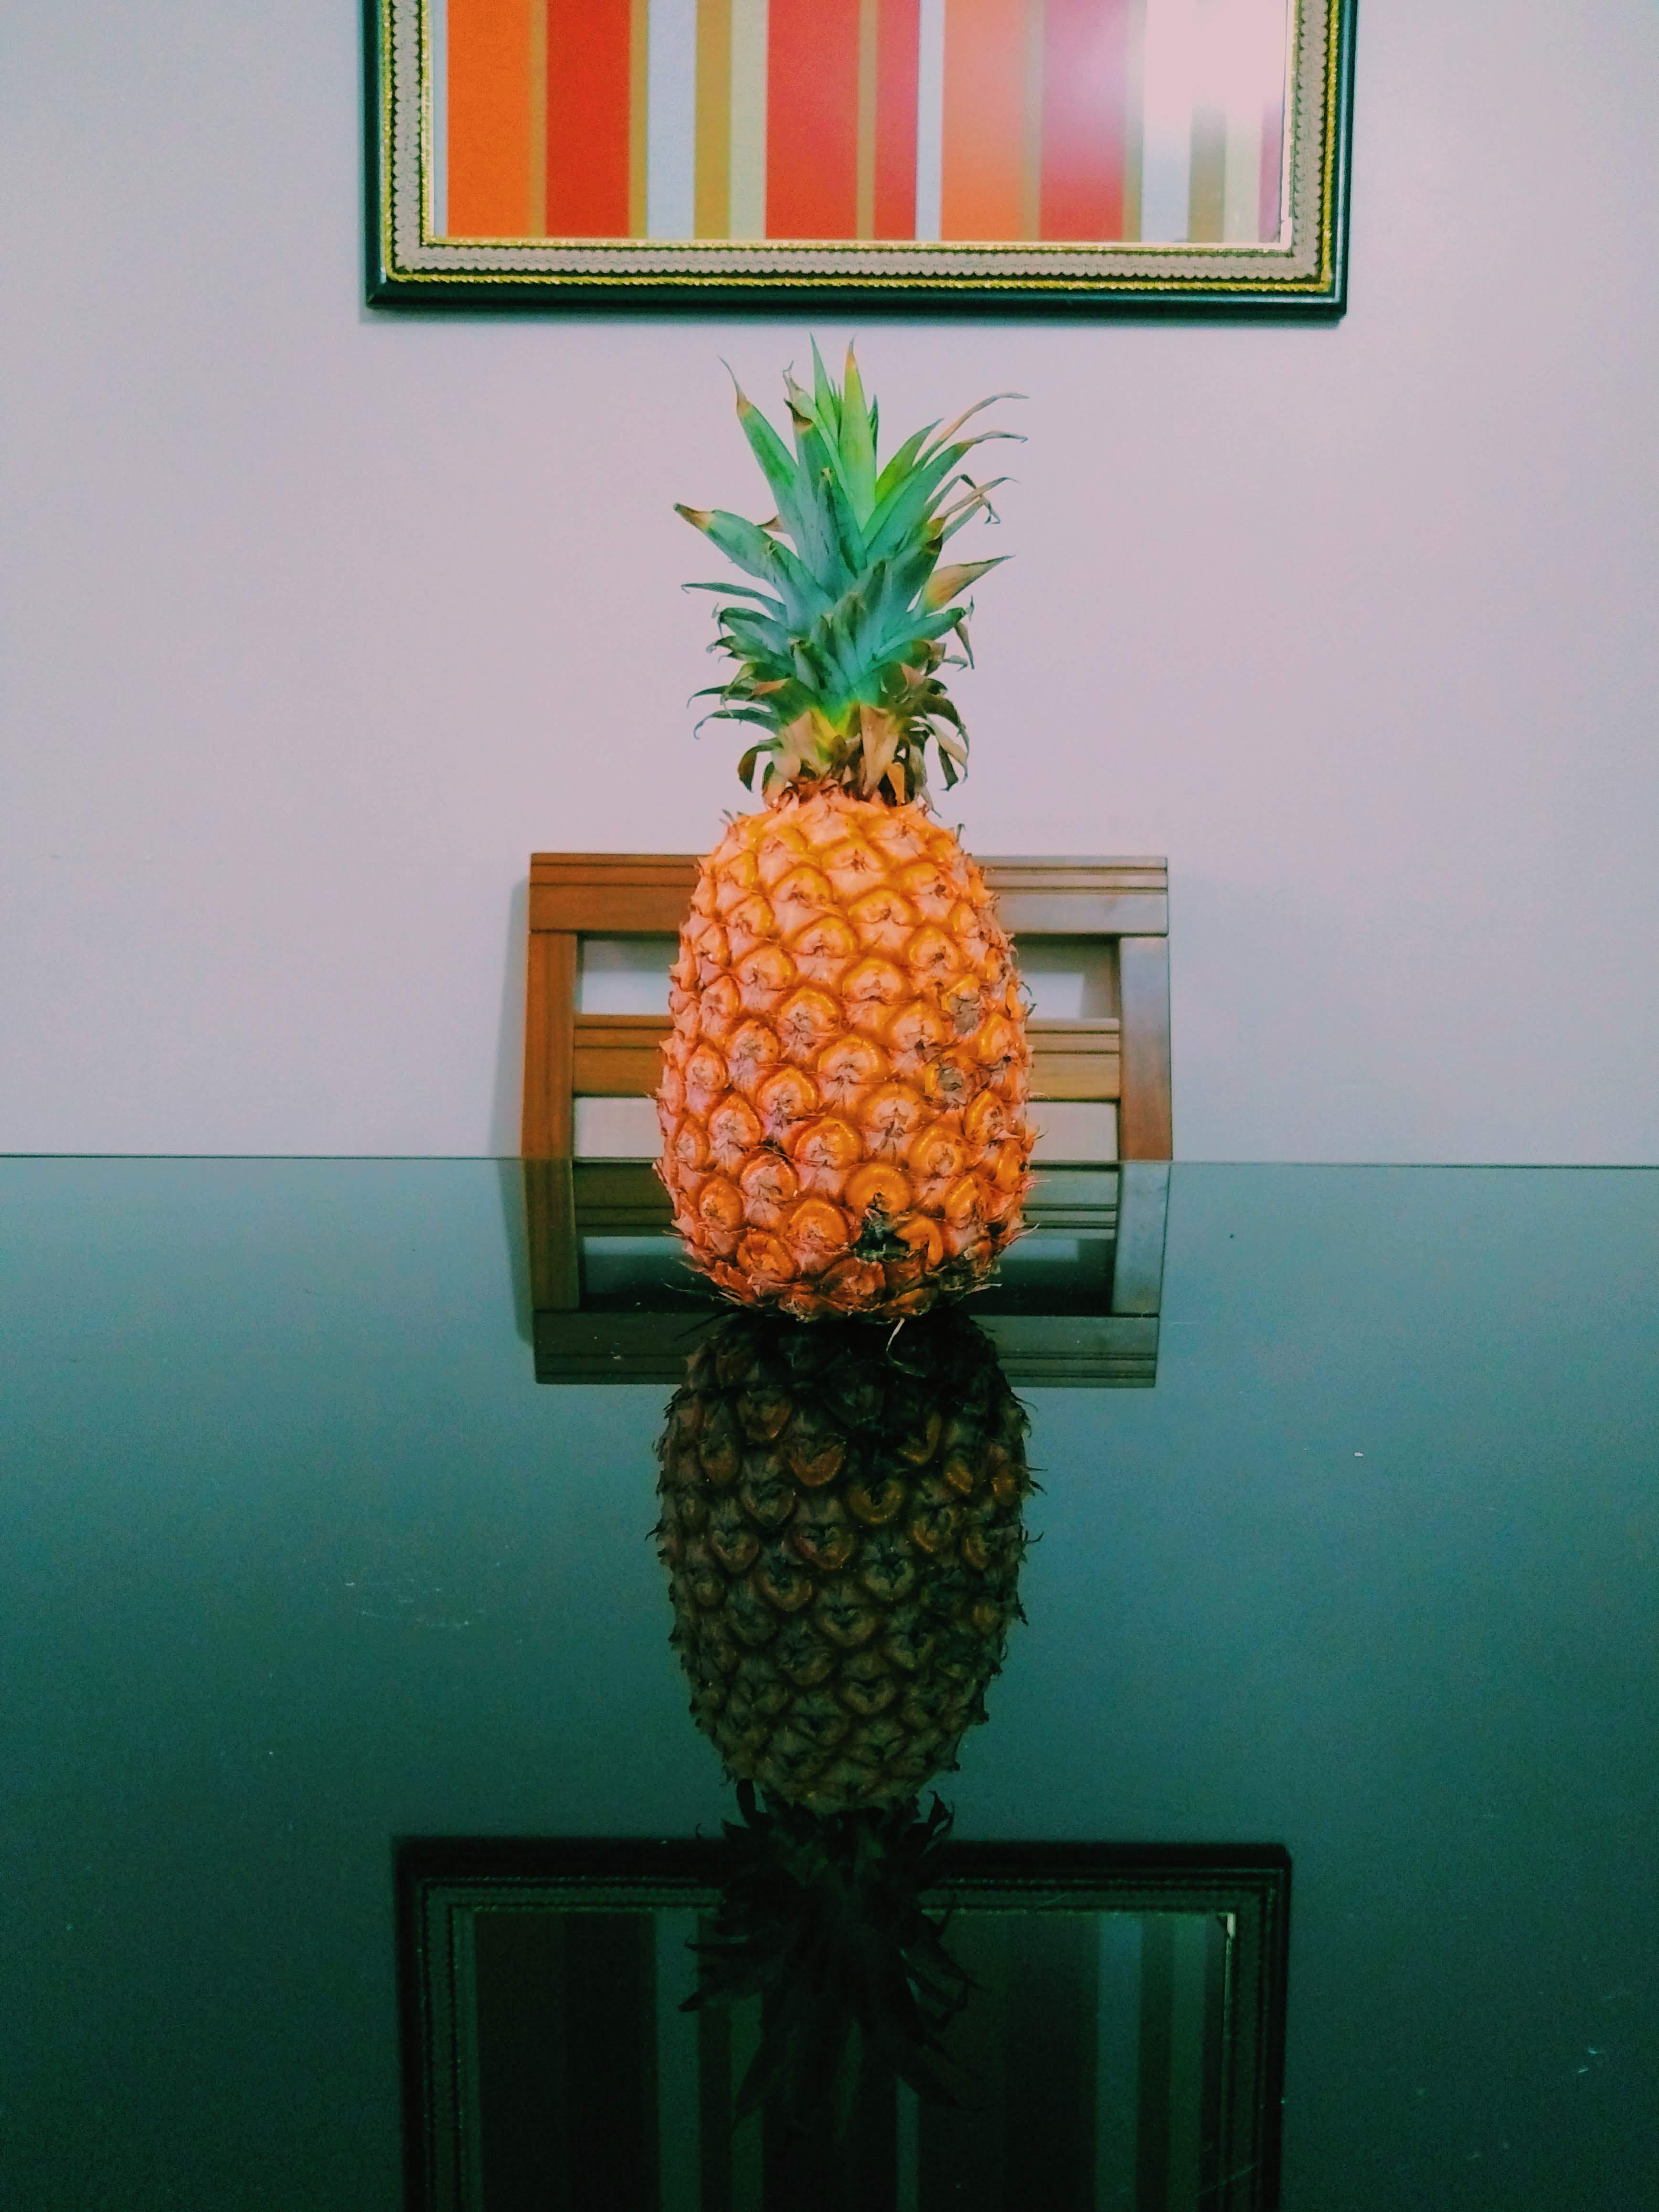 Gratis arkivbilde med ananas, bilderamme, bord, dekor